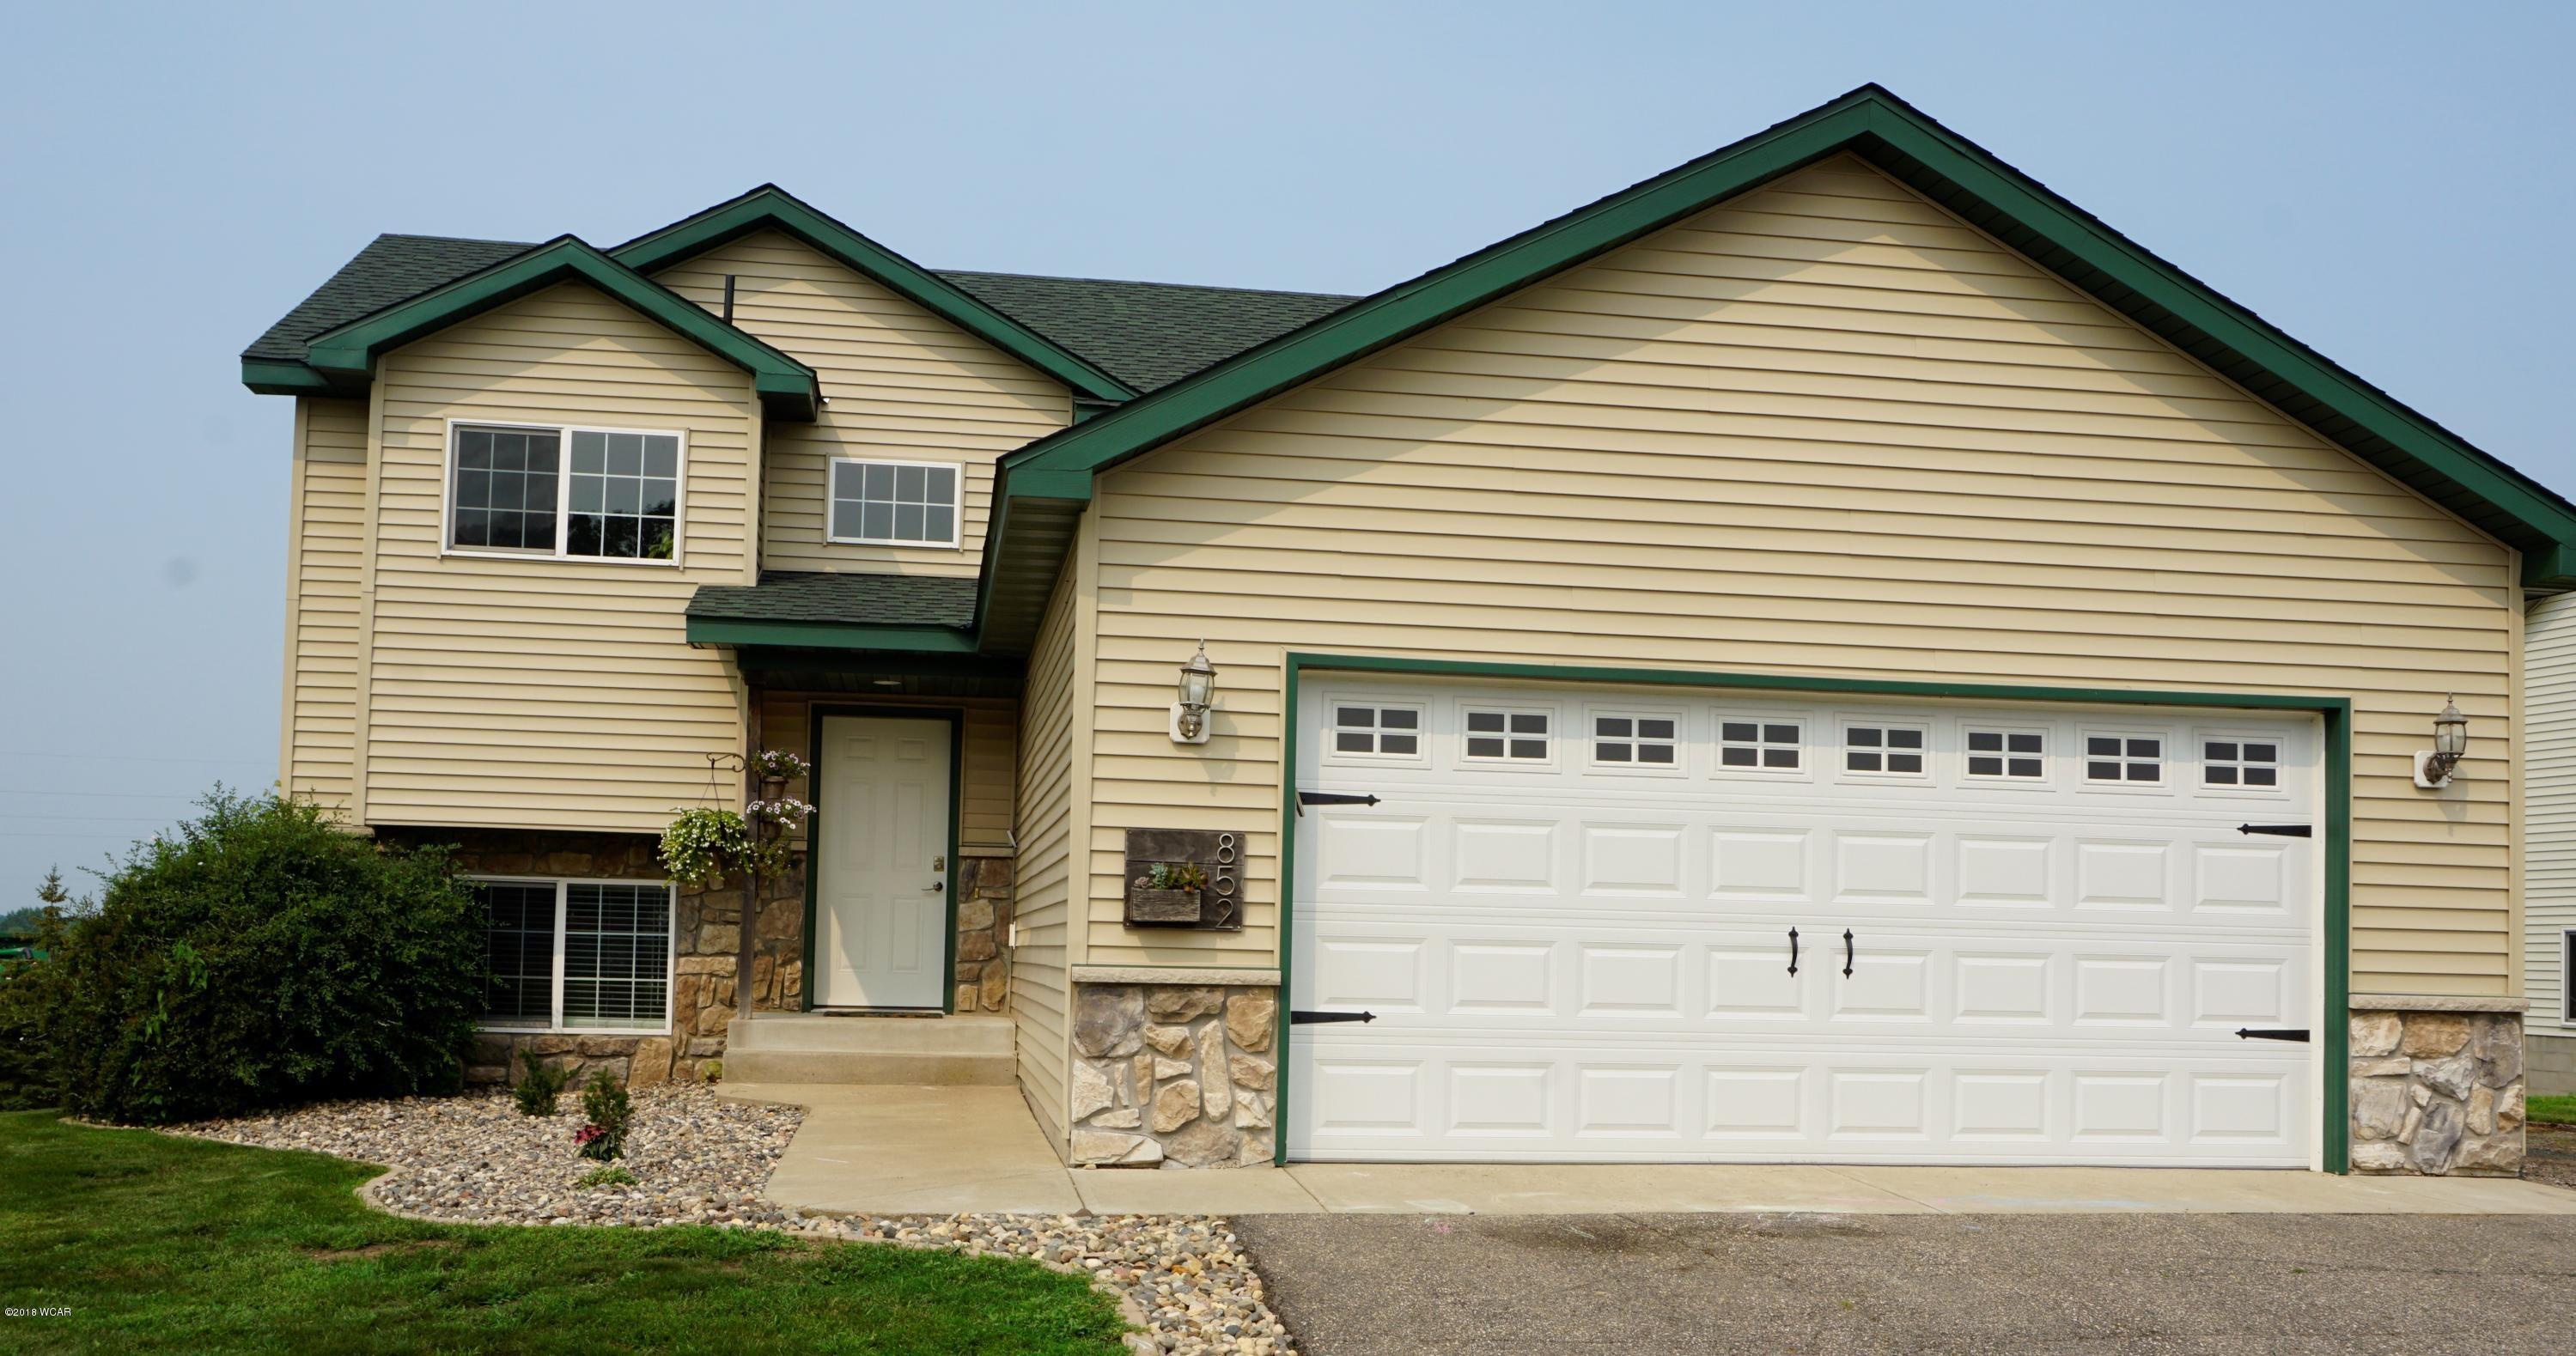 852 Poplar Drive,Kimball,3 Bedrooms Bedrooms,1 BathroomBathrooms,Single Family,Poplar Drive,6031900